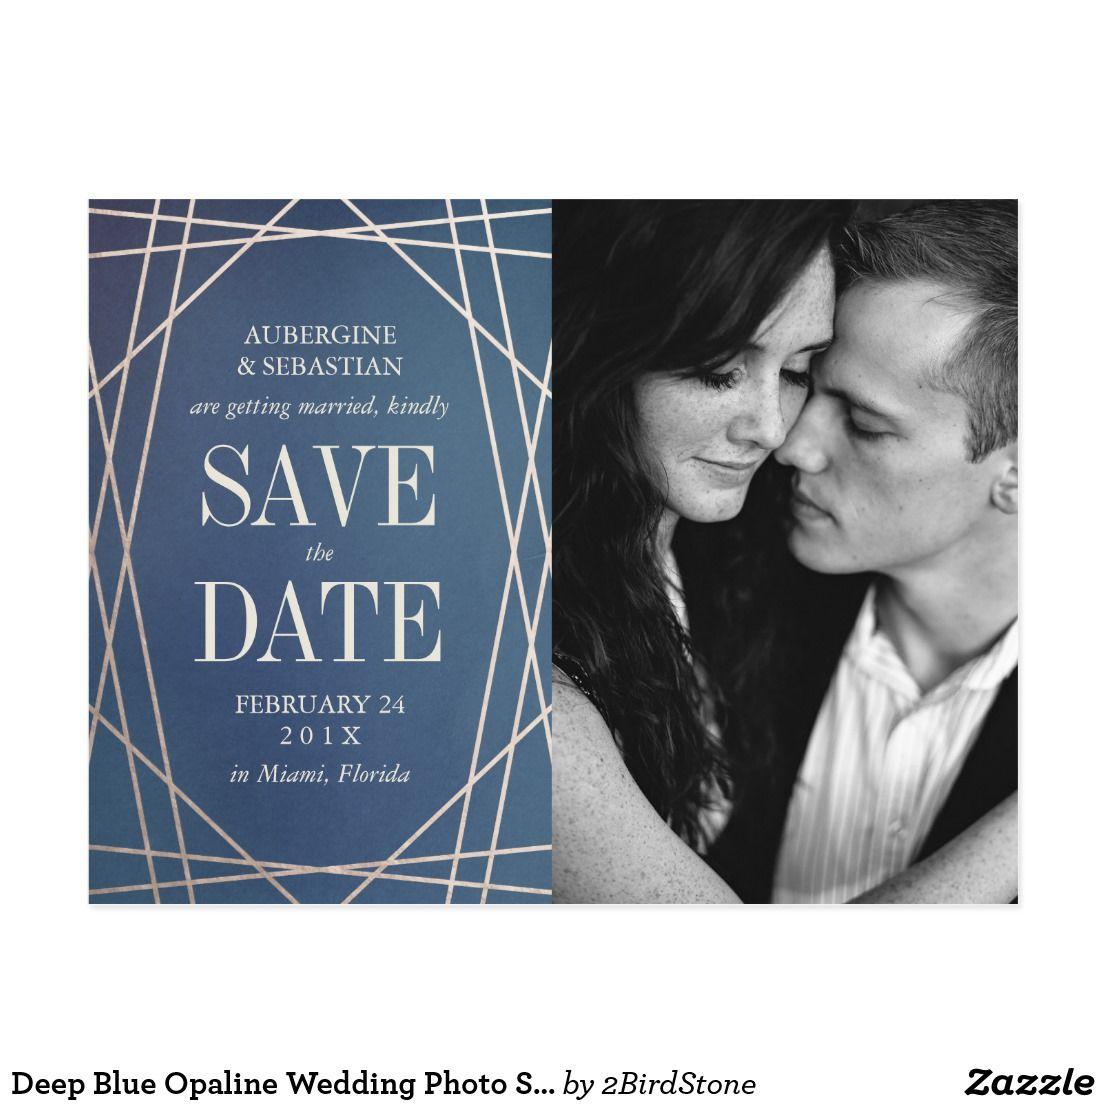 Deep Blue Opaline Wedding Photo Save the Date Gold Postcard ...